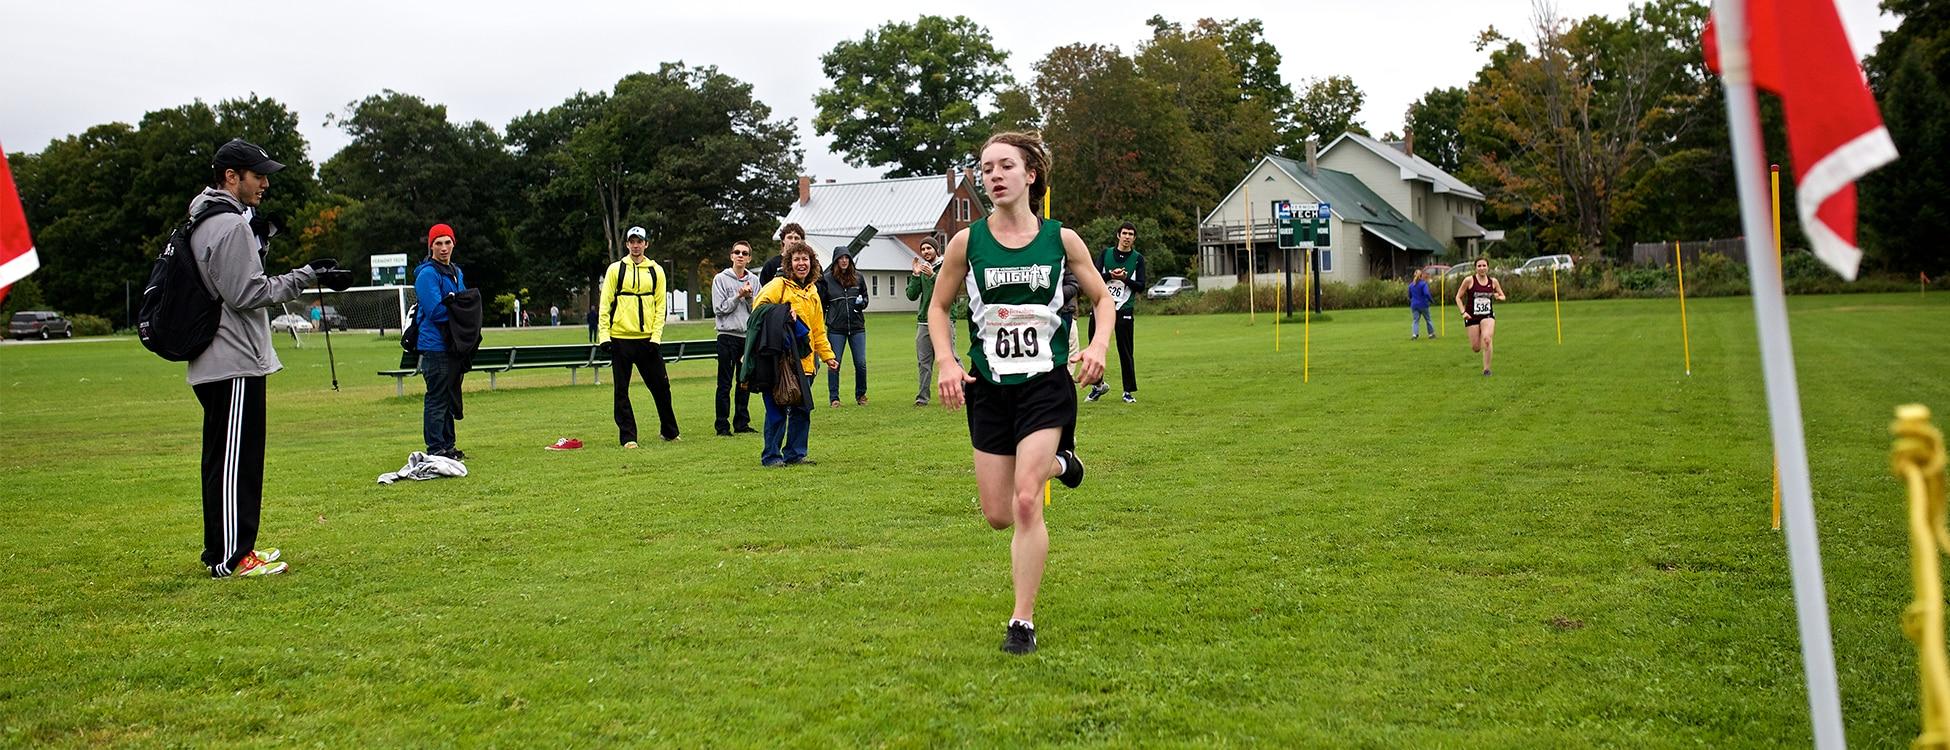 cross country, athletics, Rebecca Broadbent, running